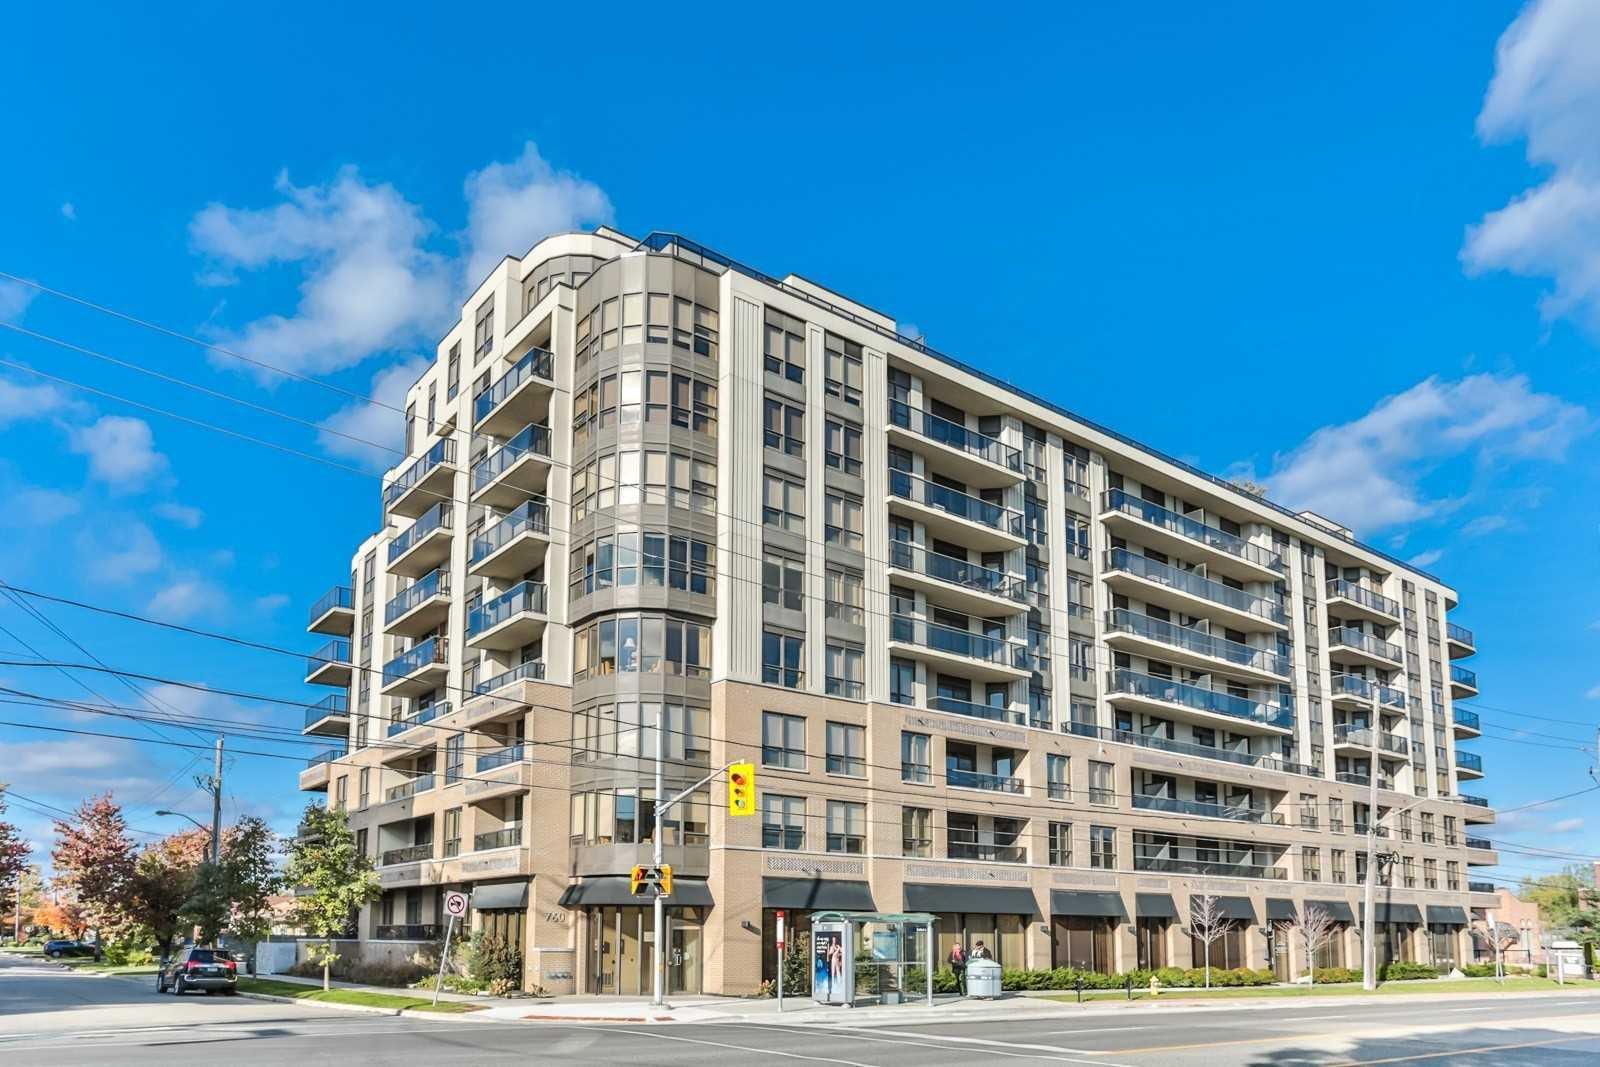 Main Photo: 805 760 W Sheppard Avenue in Toronto: Clanton Park Condo for lease (Toronto C06)  : MLS®# C4600124